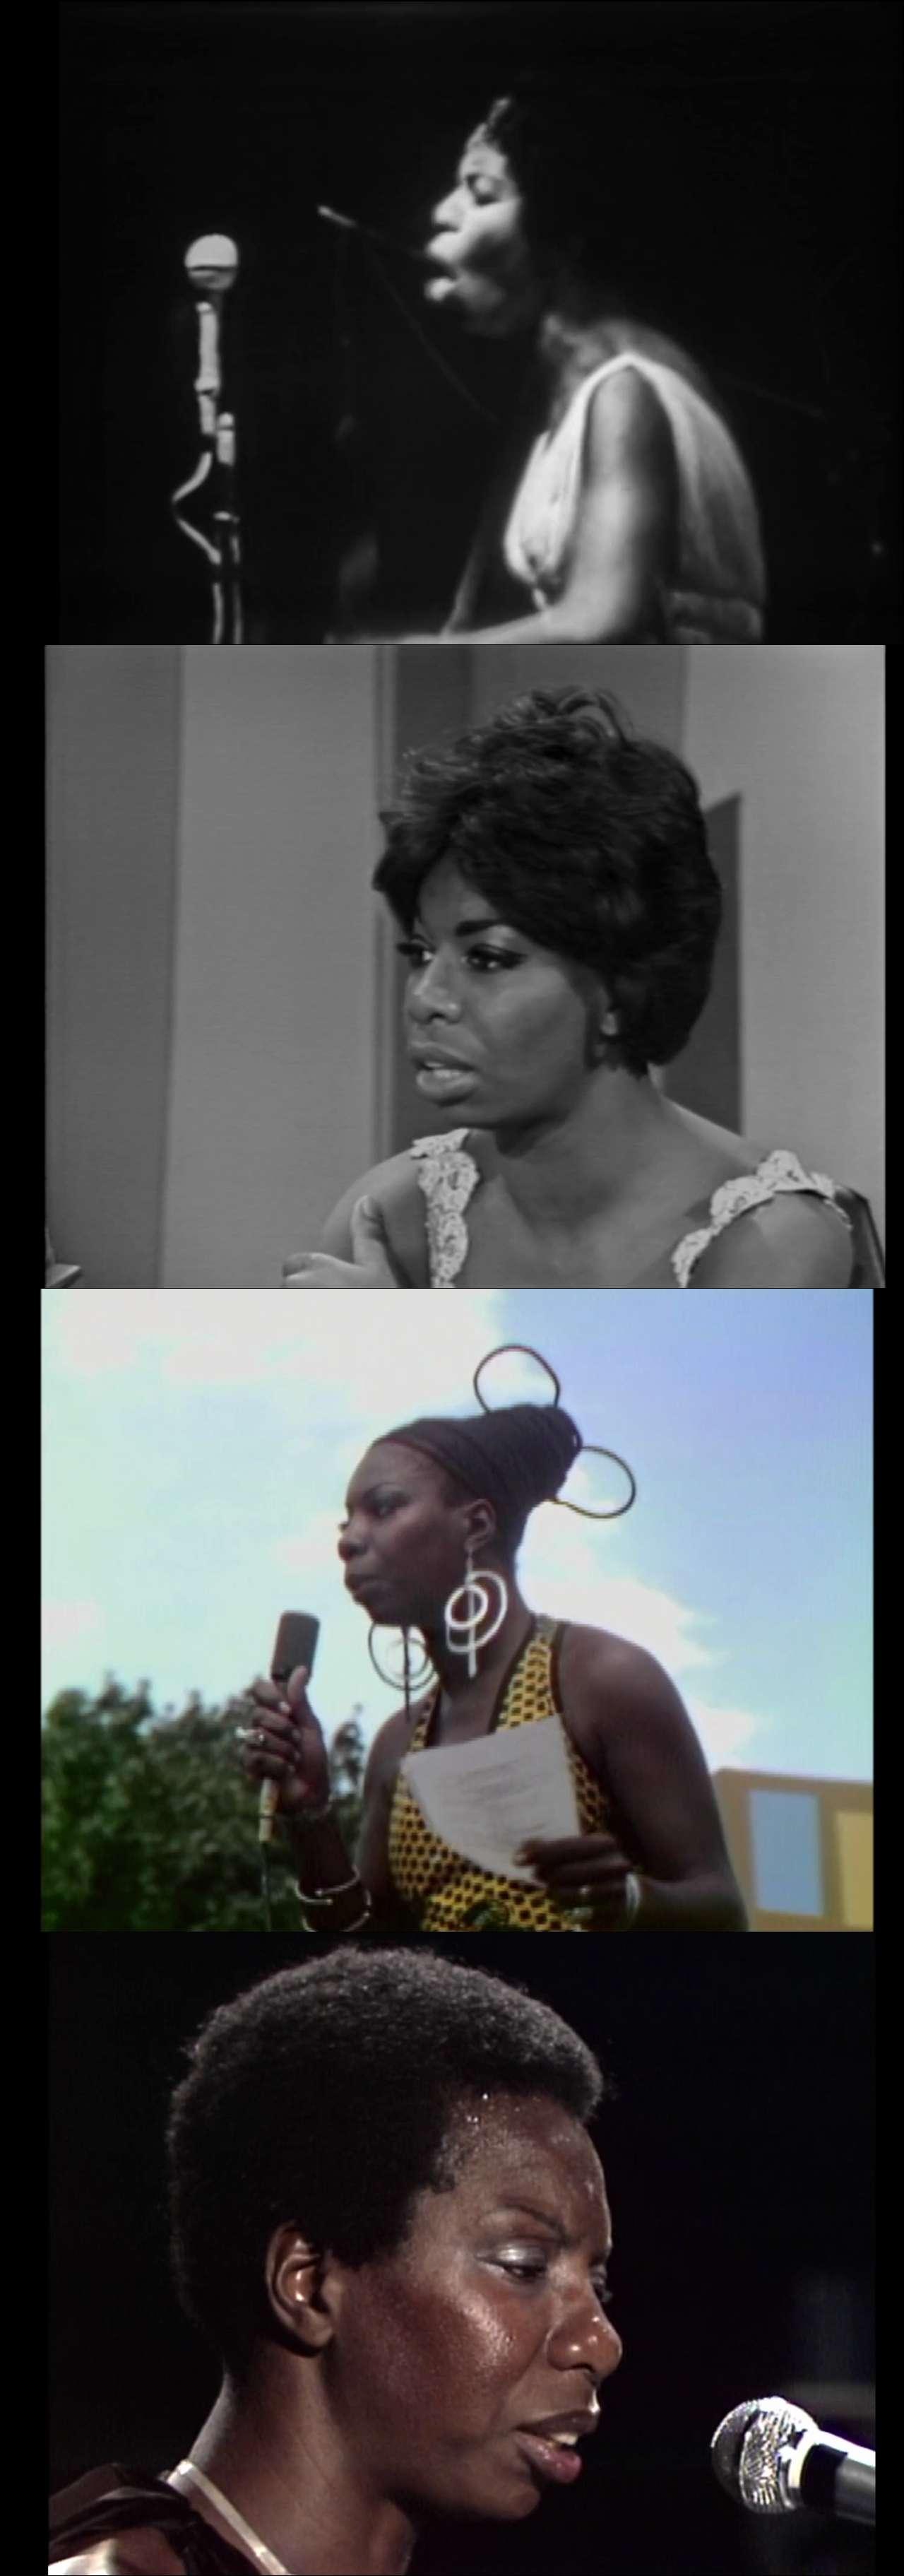 Miss Simone'a Ne Oldu - What Happened, Miss Simone? (2015) türkçe dublaj belgesel indir